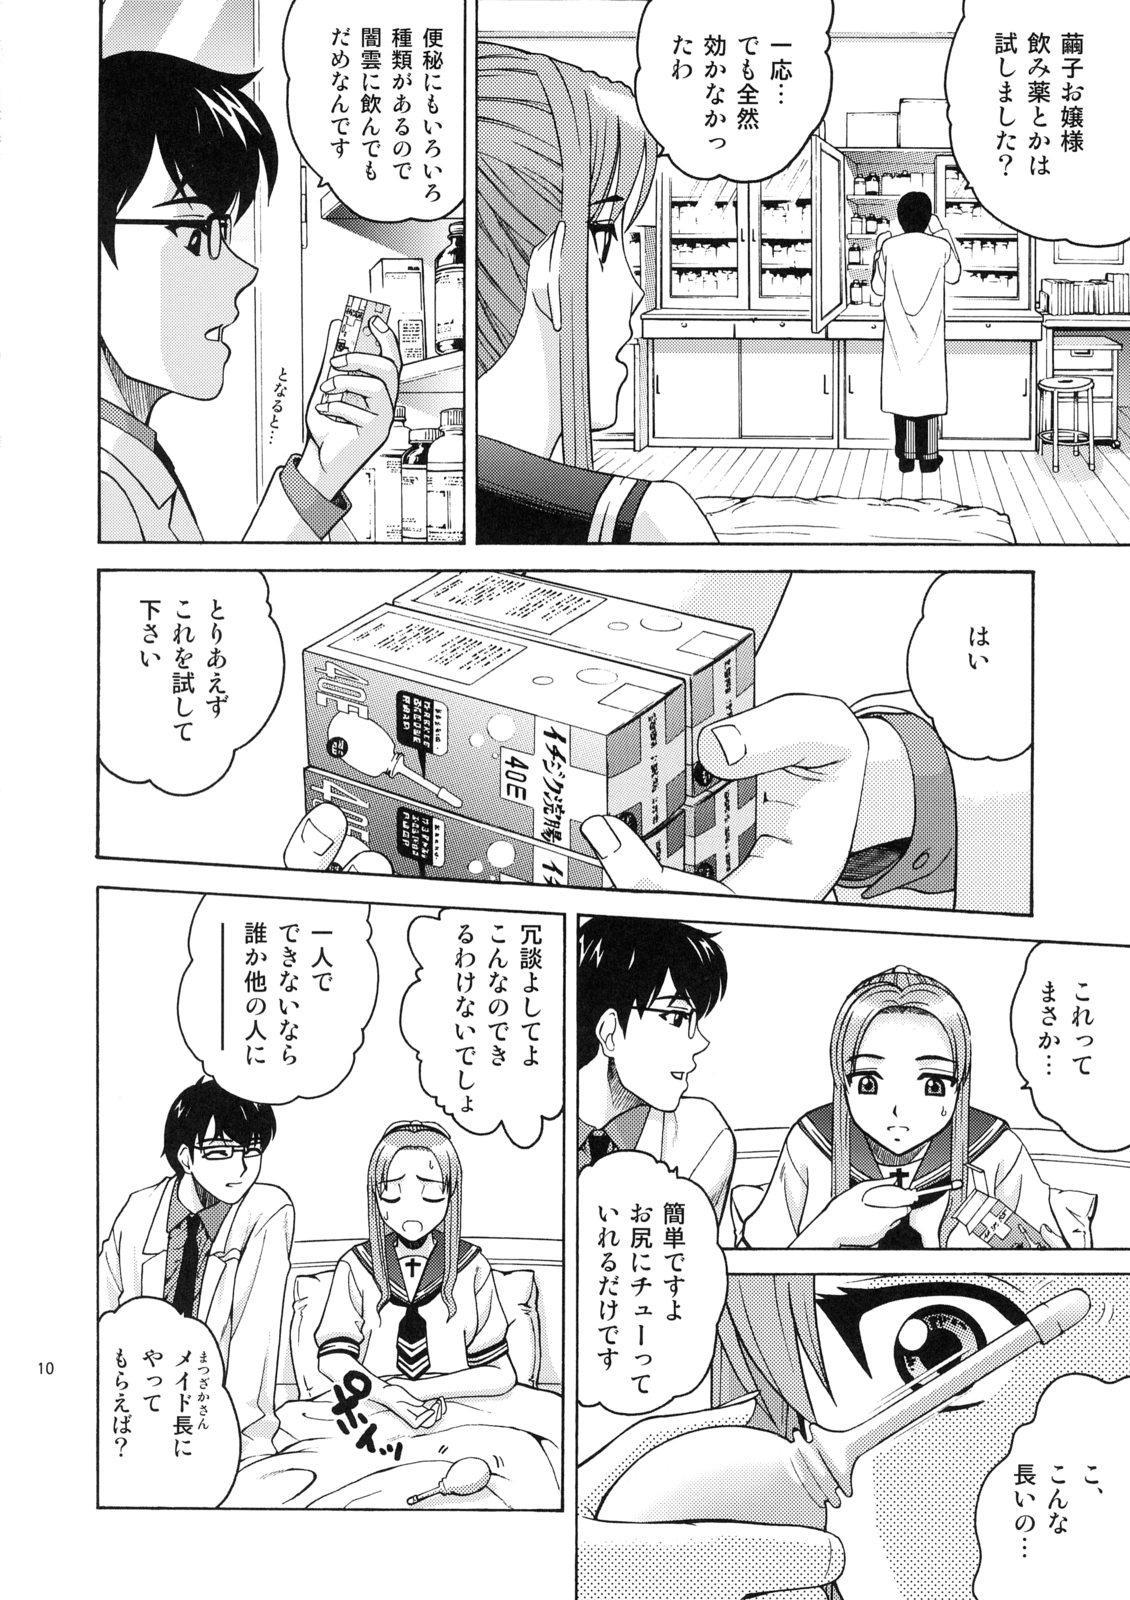 (C72) [Cool Brain (Kitani Sai)] ANGEL PAIN Extra 4 -Ojou-sama Scatology- 8